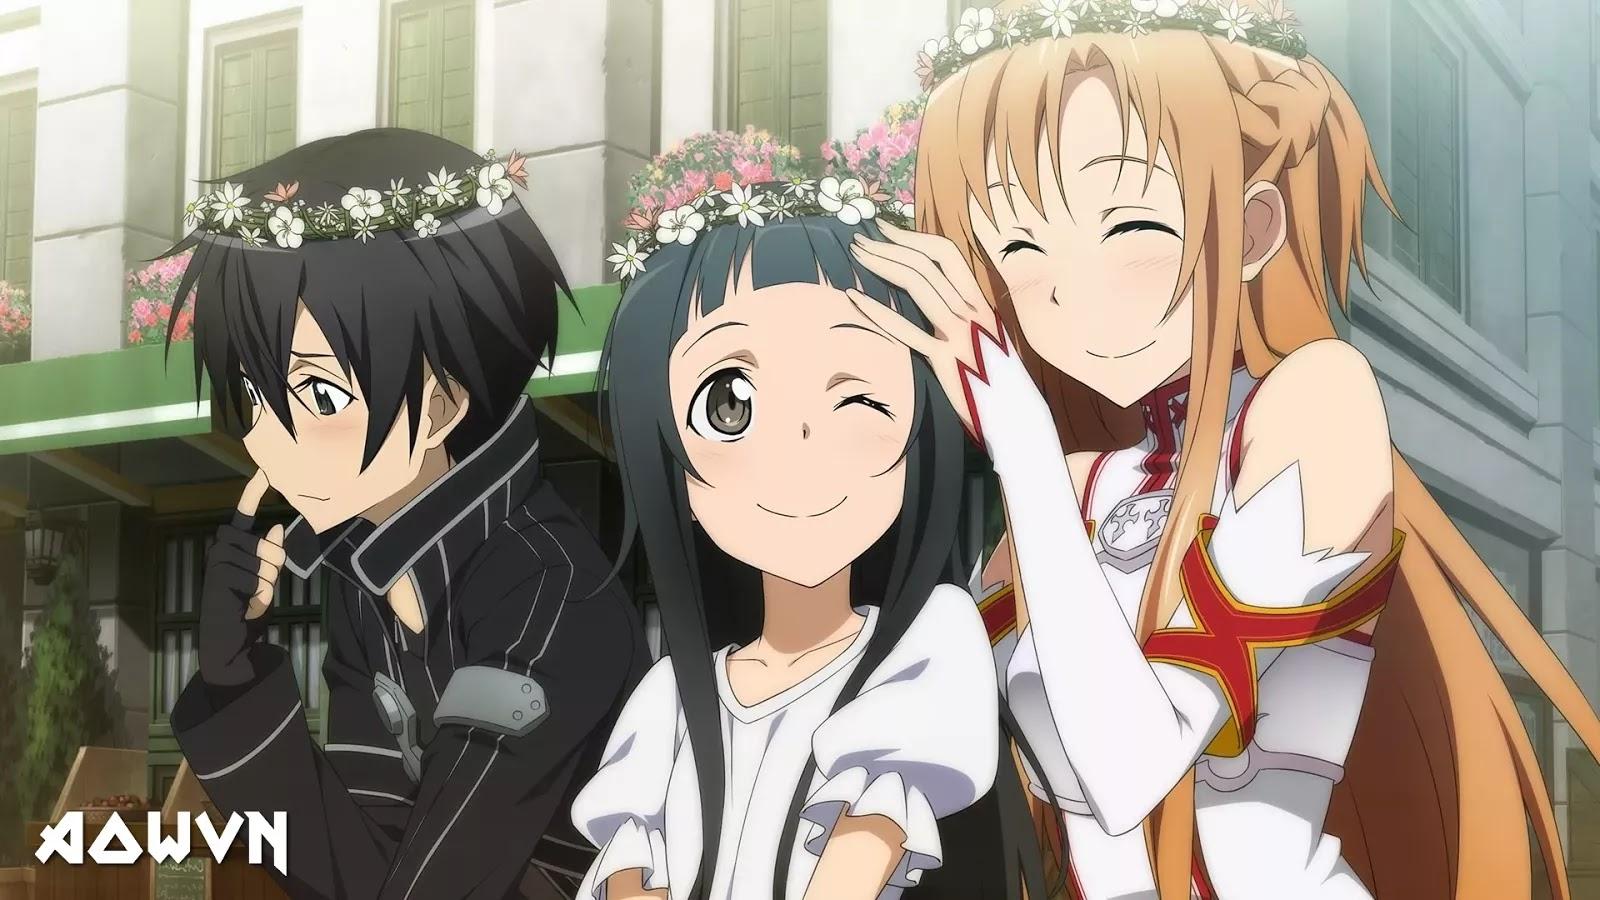 AowVN.org min%2B%25281%2529 - [ Anime 3gp Mp4 ] Sword Art Online SS1 + SS2 BD + Movie Extra   Vietsub - Siêu Phẩm